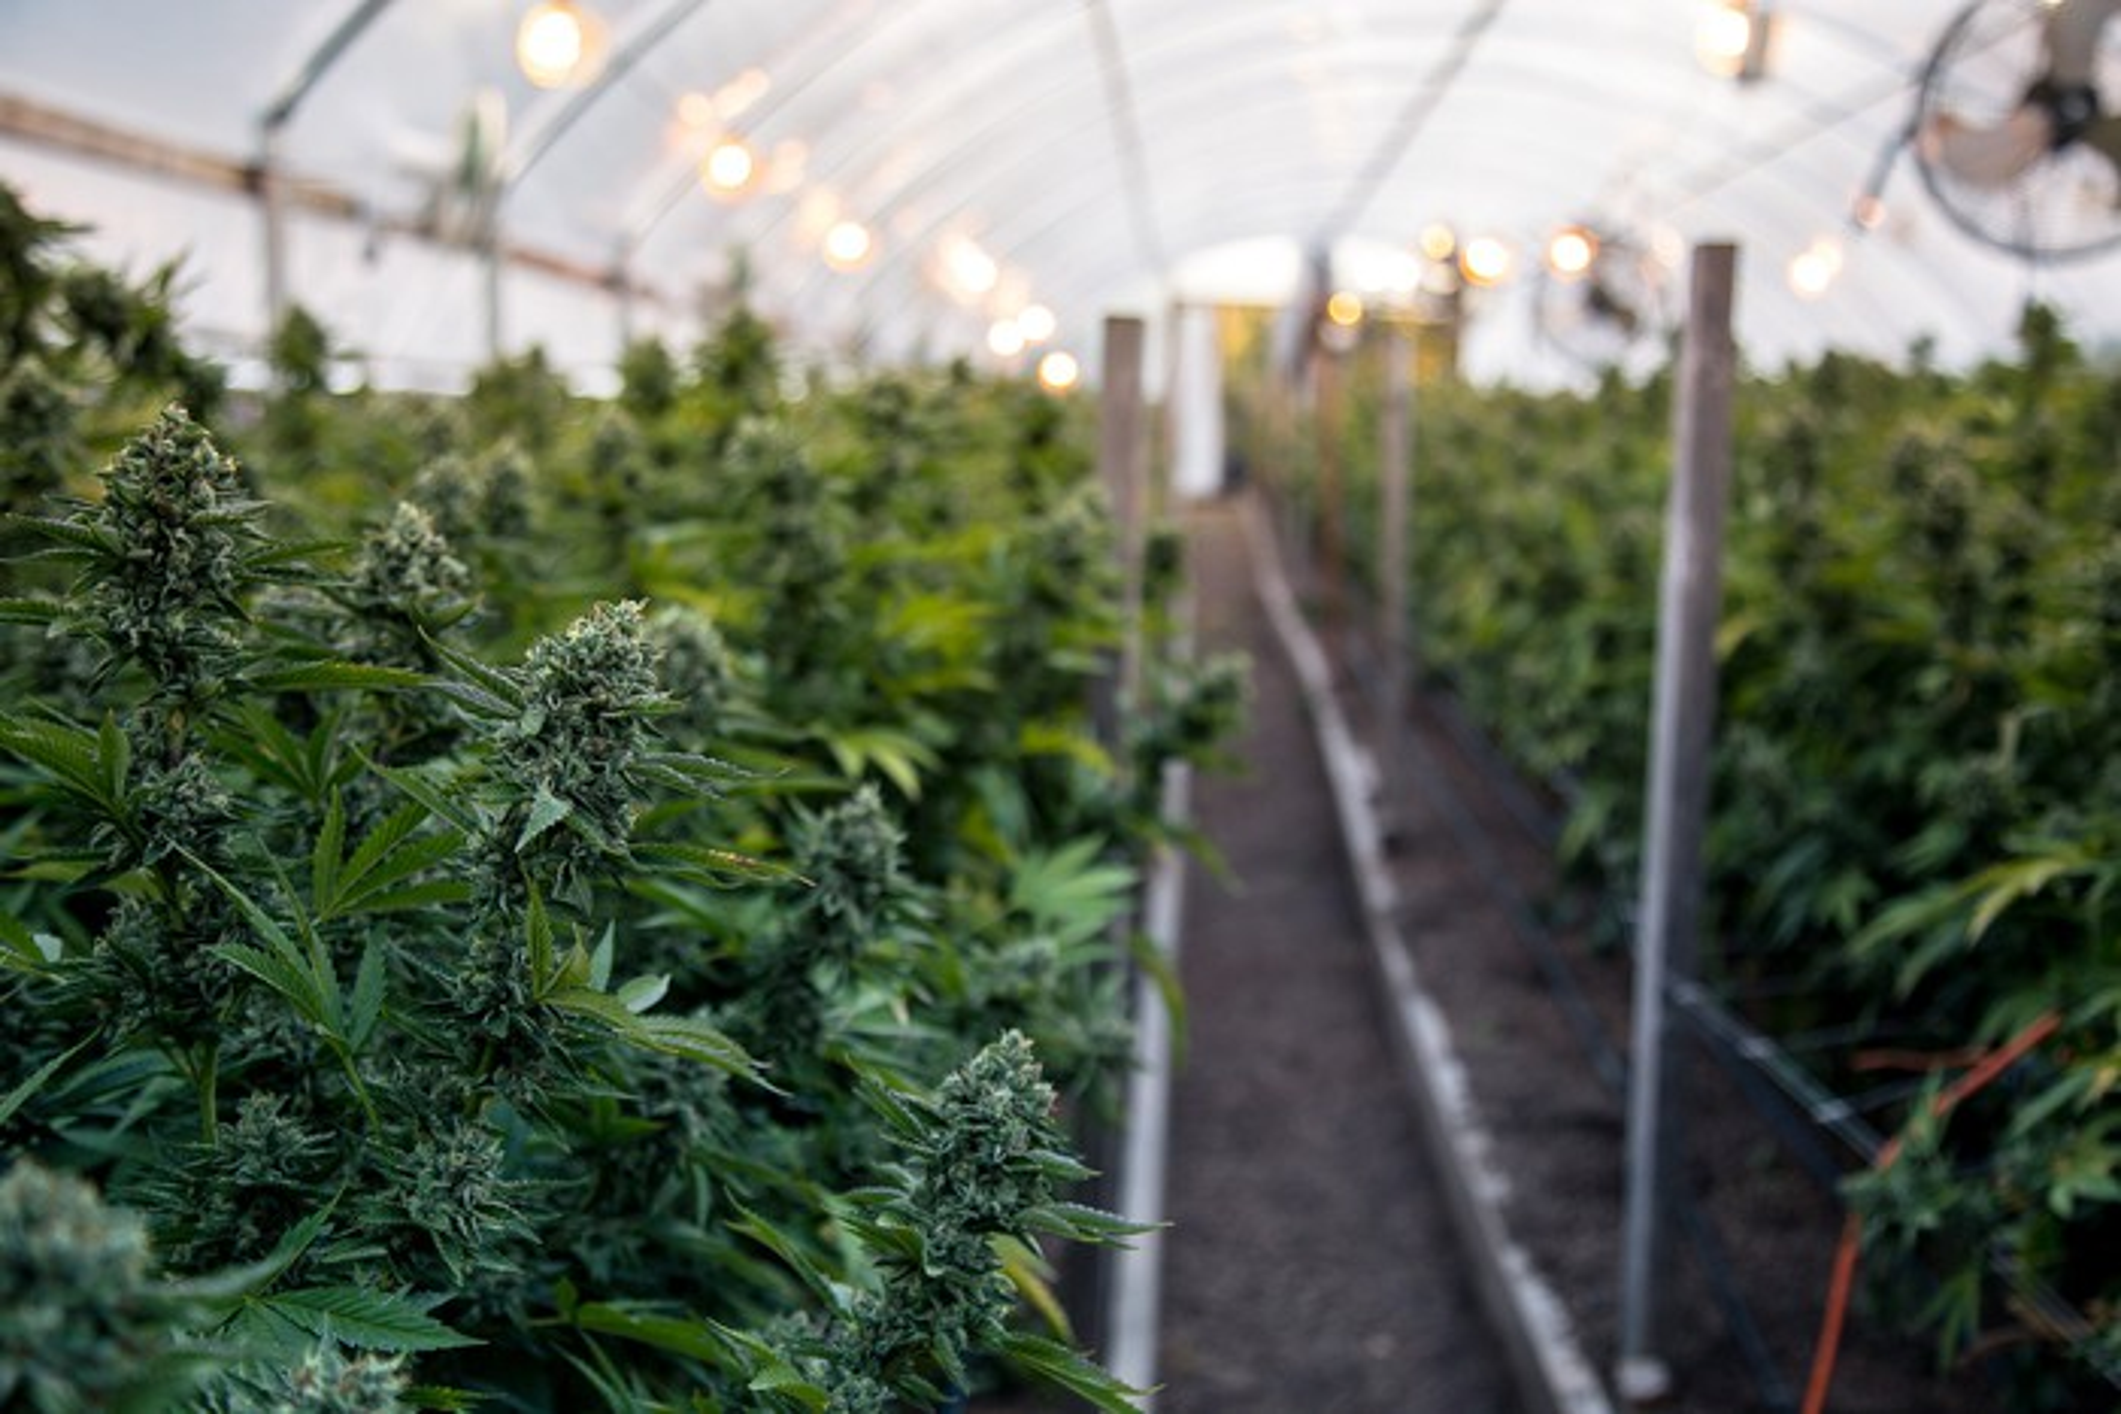 A greenhouse full of marijuana plants